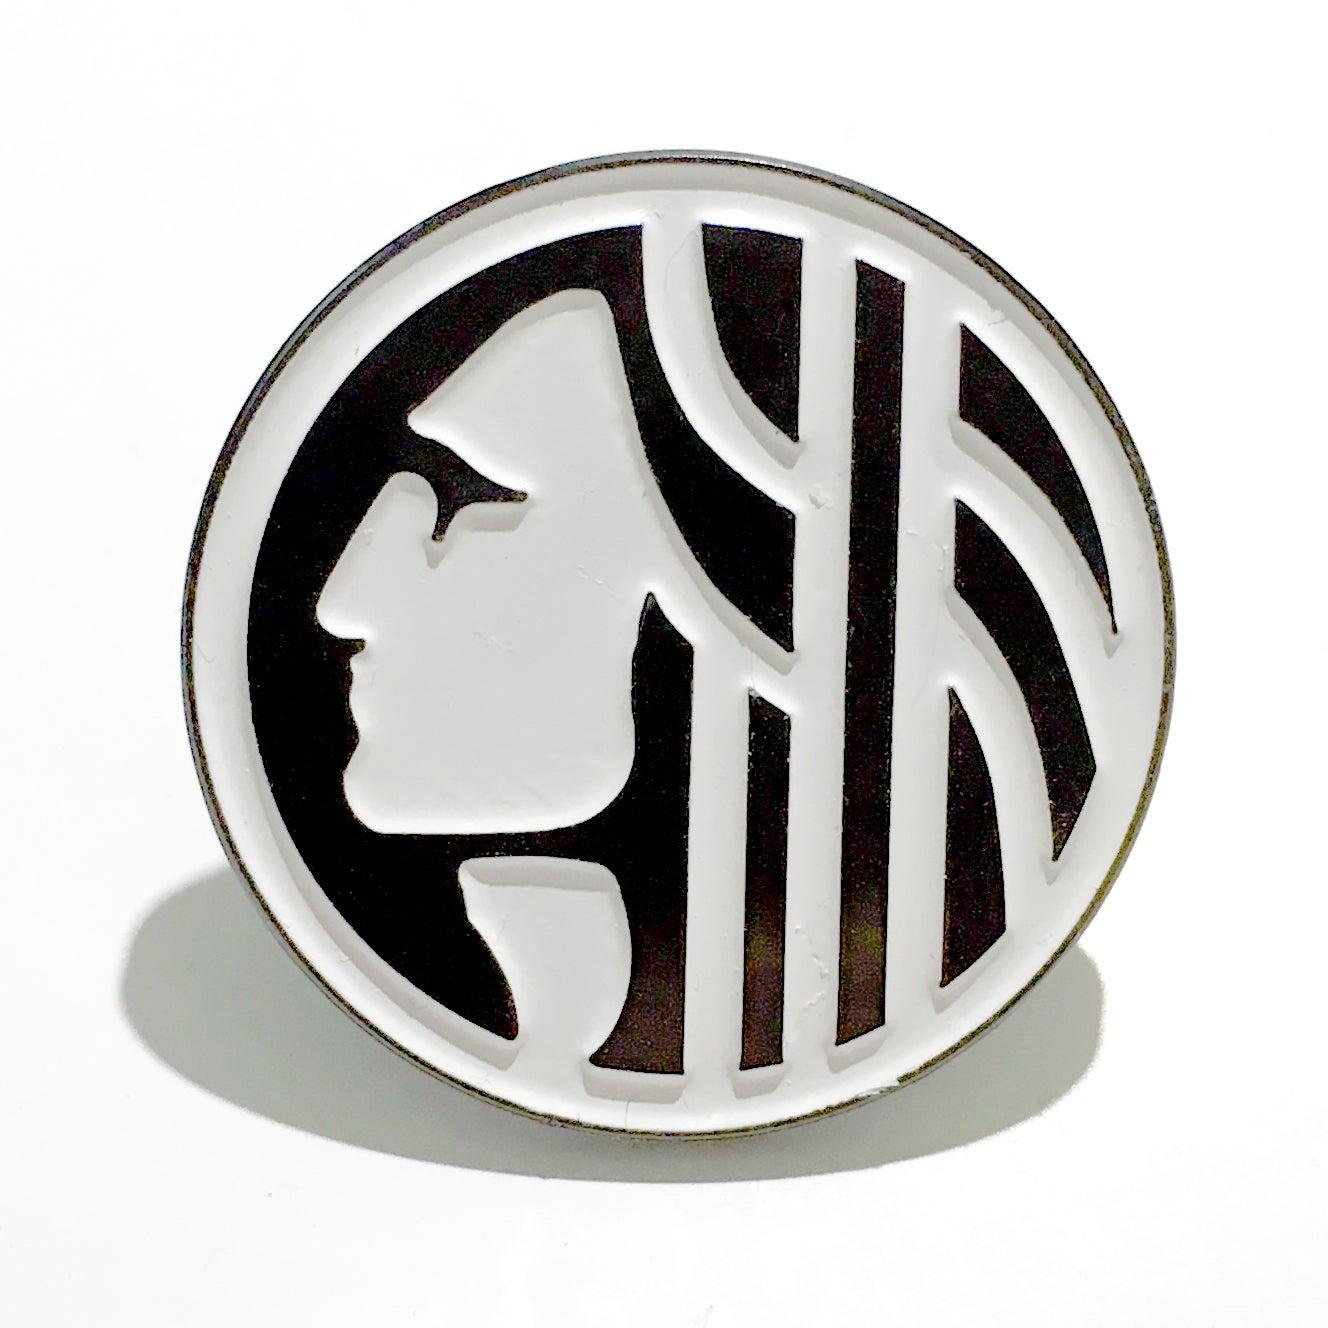 Image of Chief Seattle enamel pin (round)